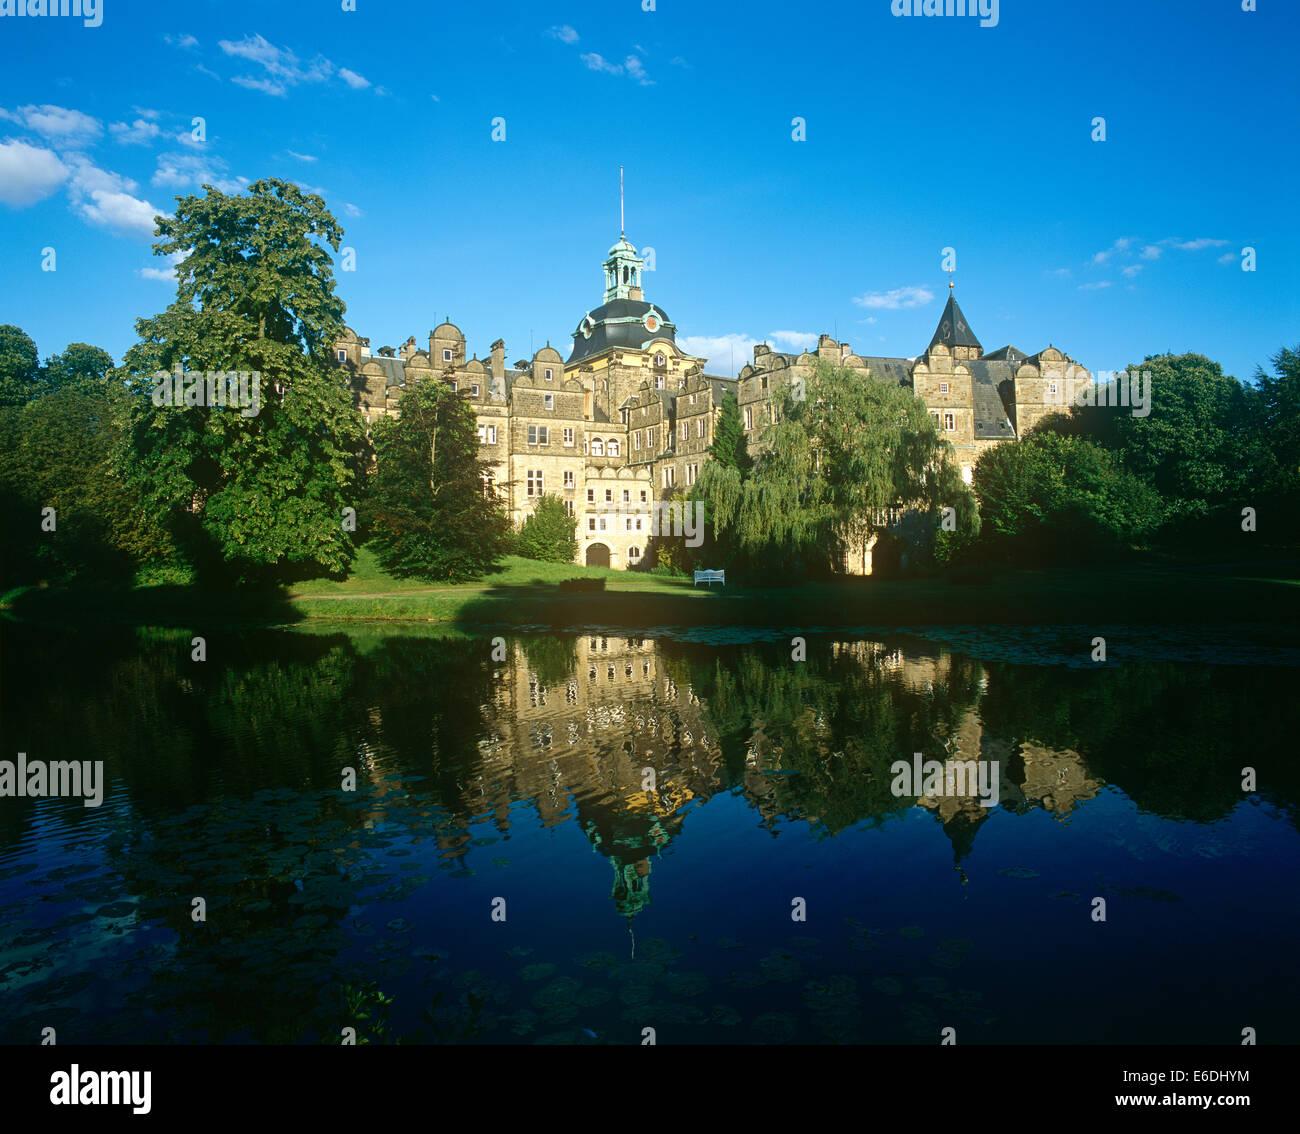 Weser Renaissance Residence Castle Lower Saxony Germany - Stock Image